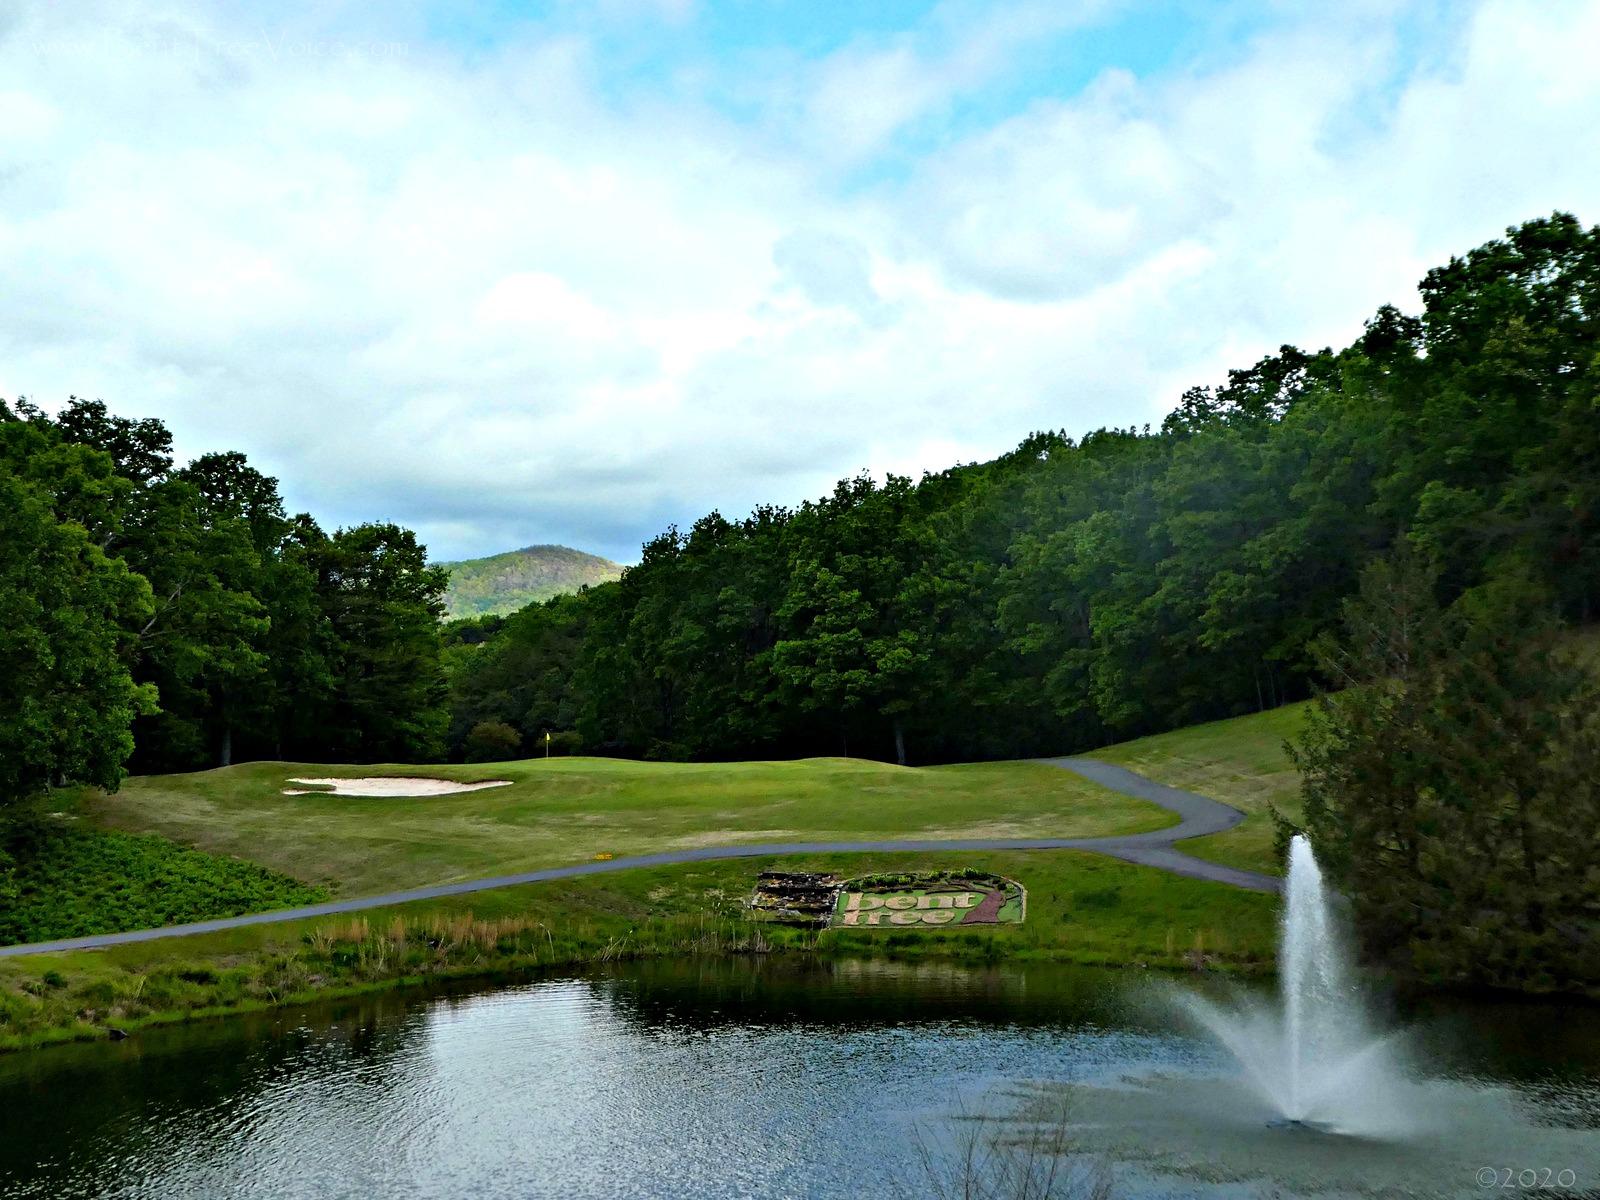 April 26, 2020 - Signature Hole 7, Bent Tree Golf Club